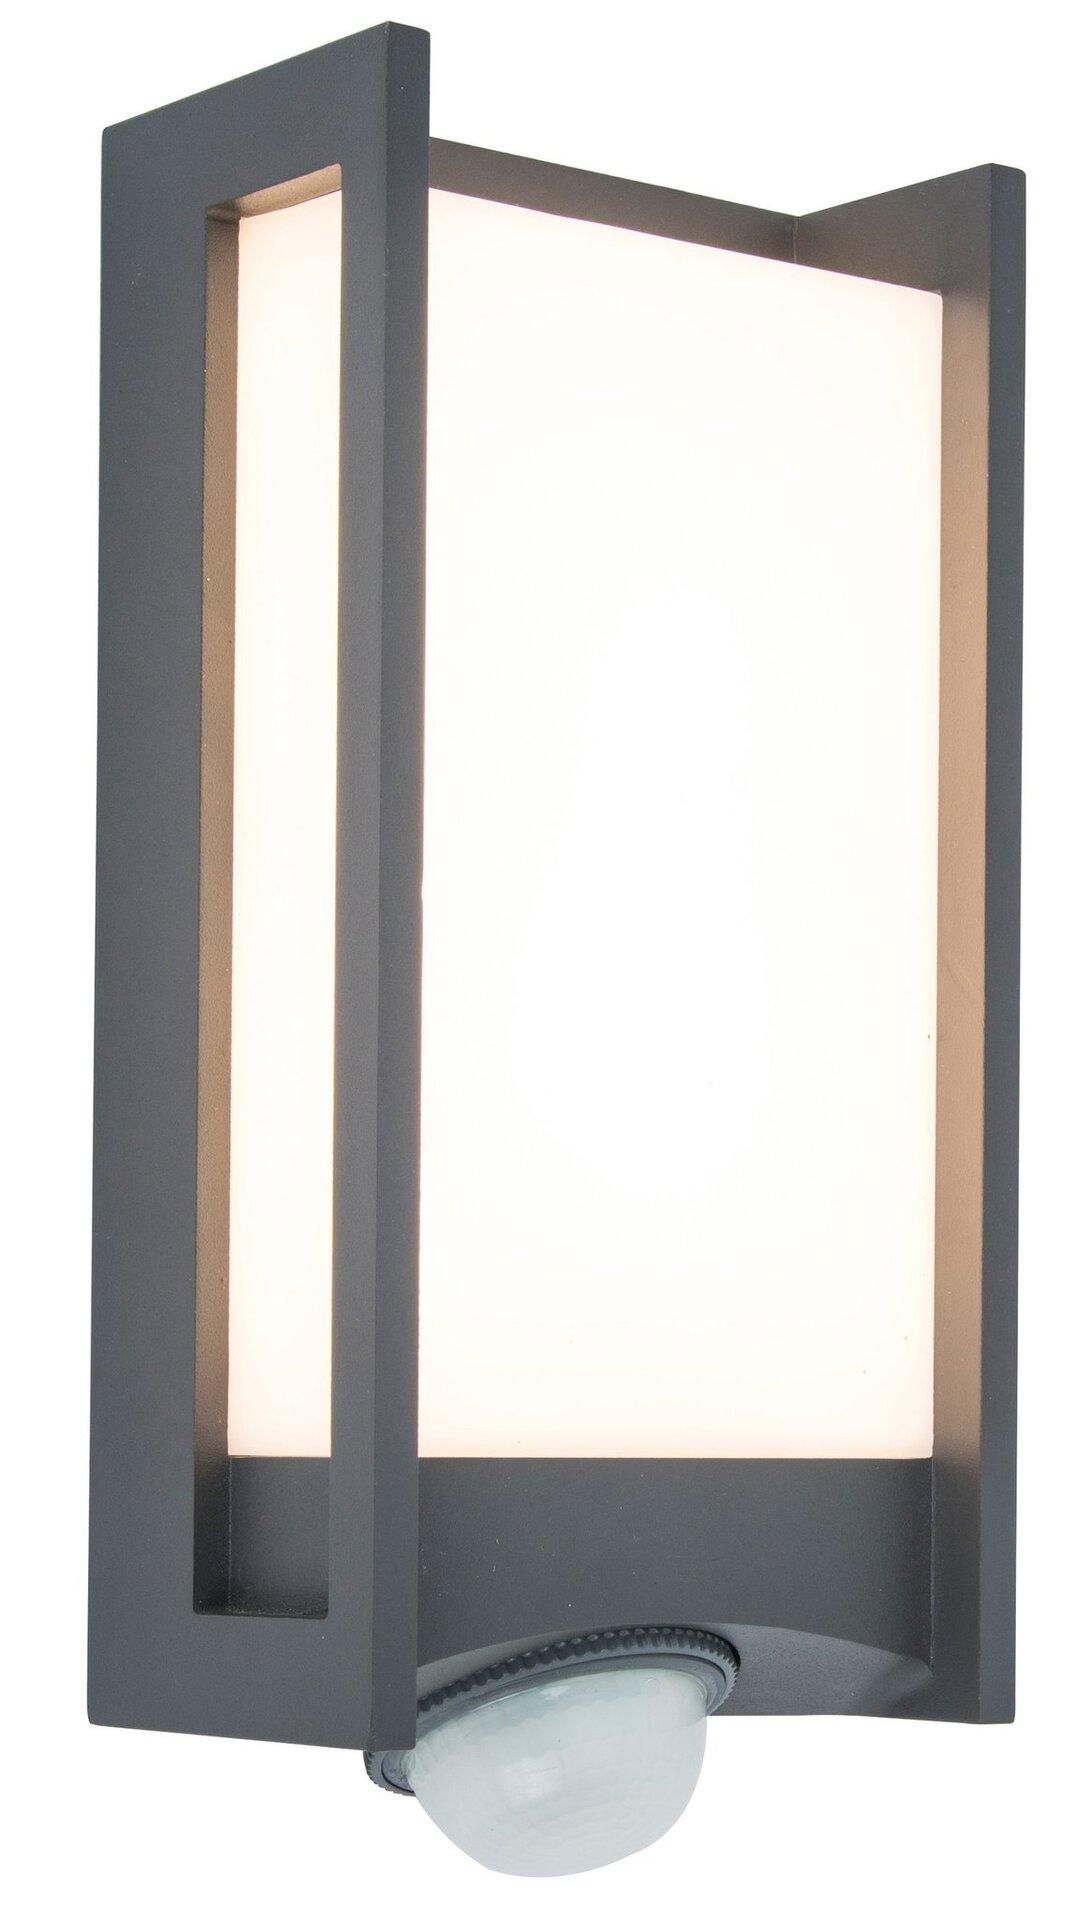 Wand-Aussenleuchte Qubo Eco-Light Metall grau 11 x 27 x 11 cm